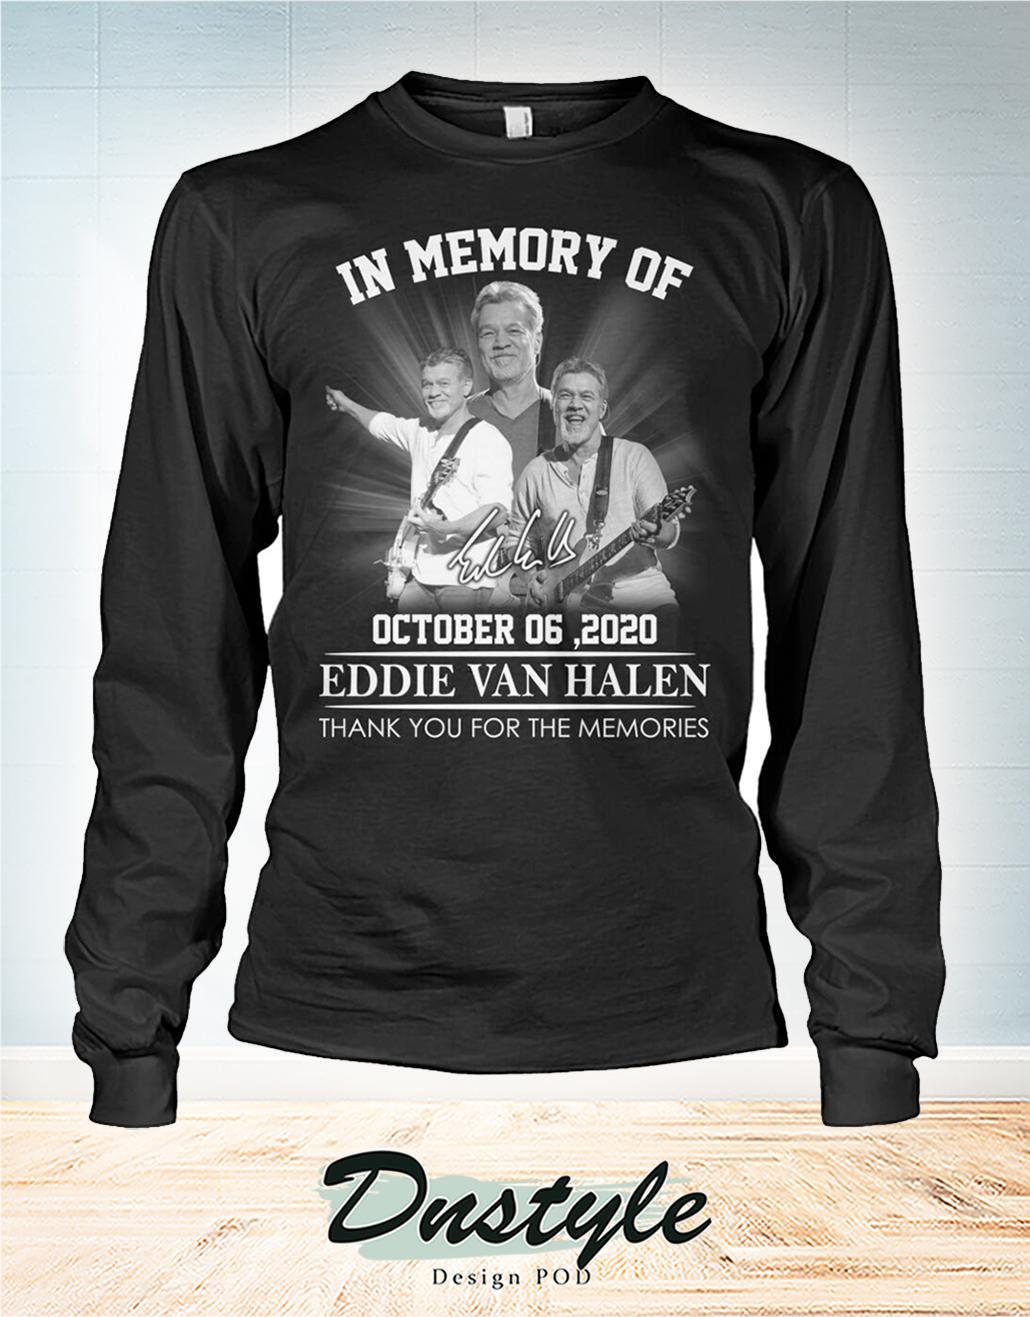 In memory of Eddie Van Halen october 6 2020 thank you for the memories long sleeve